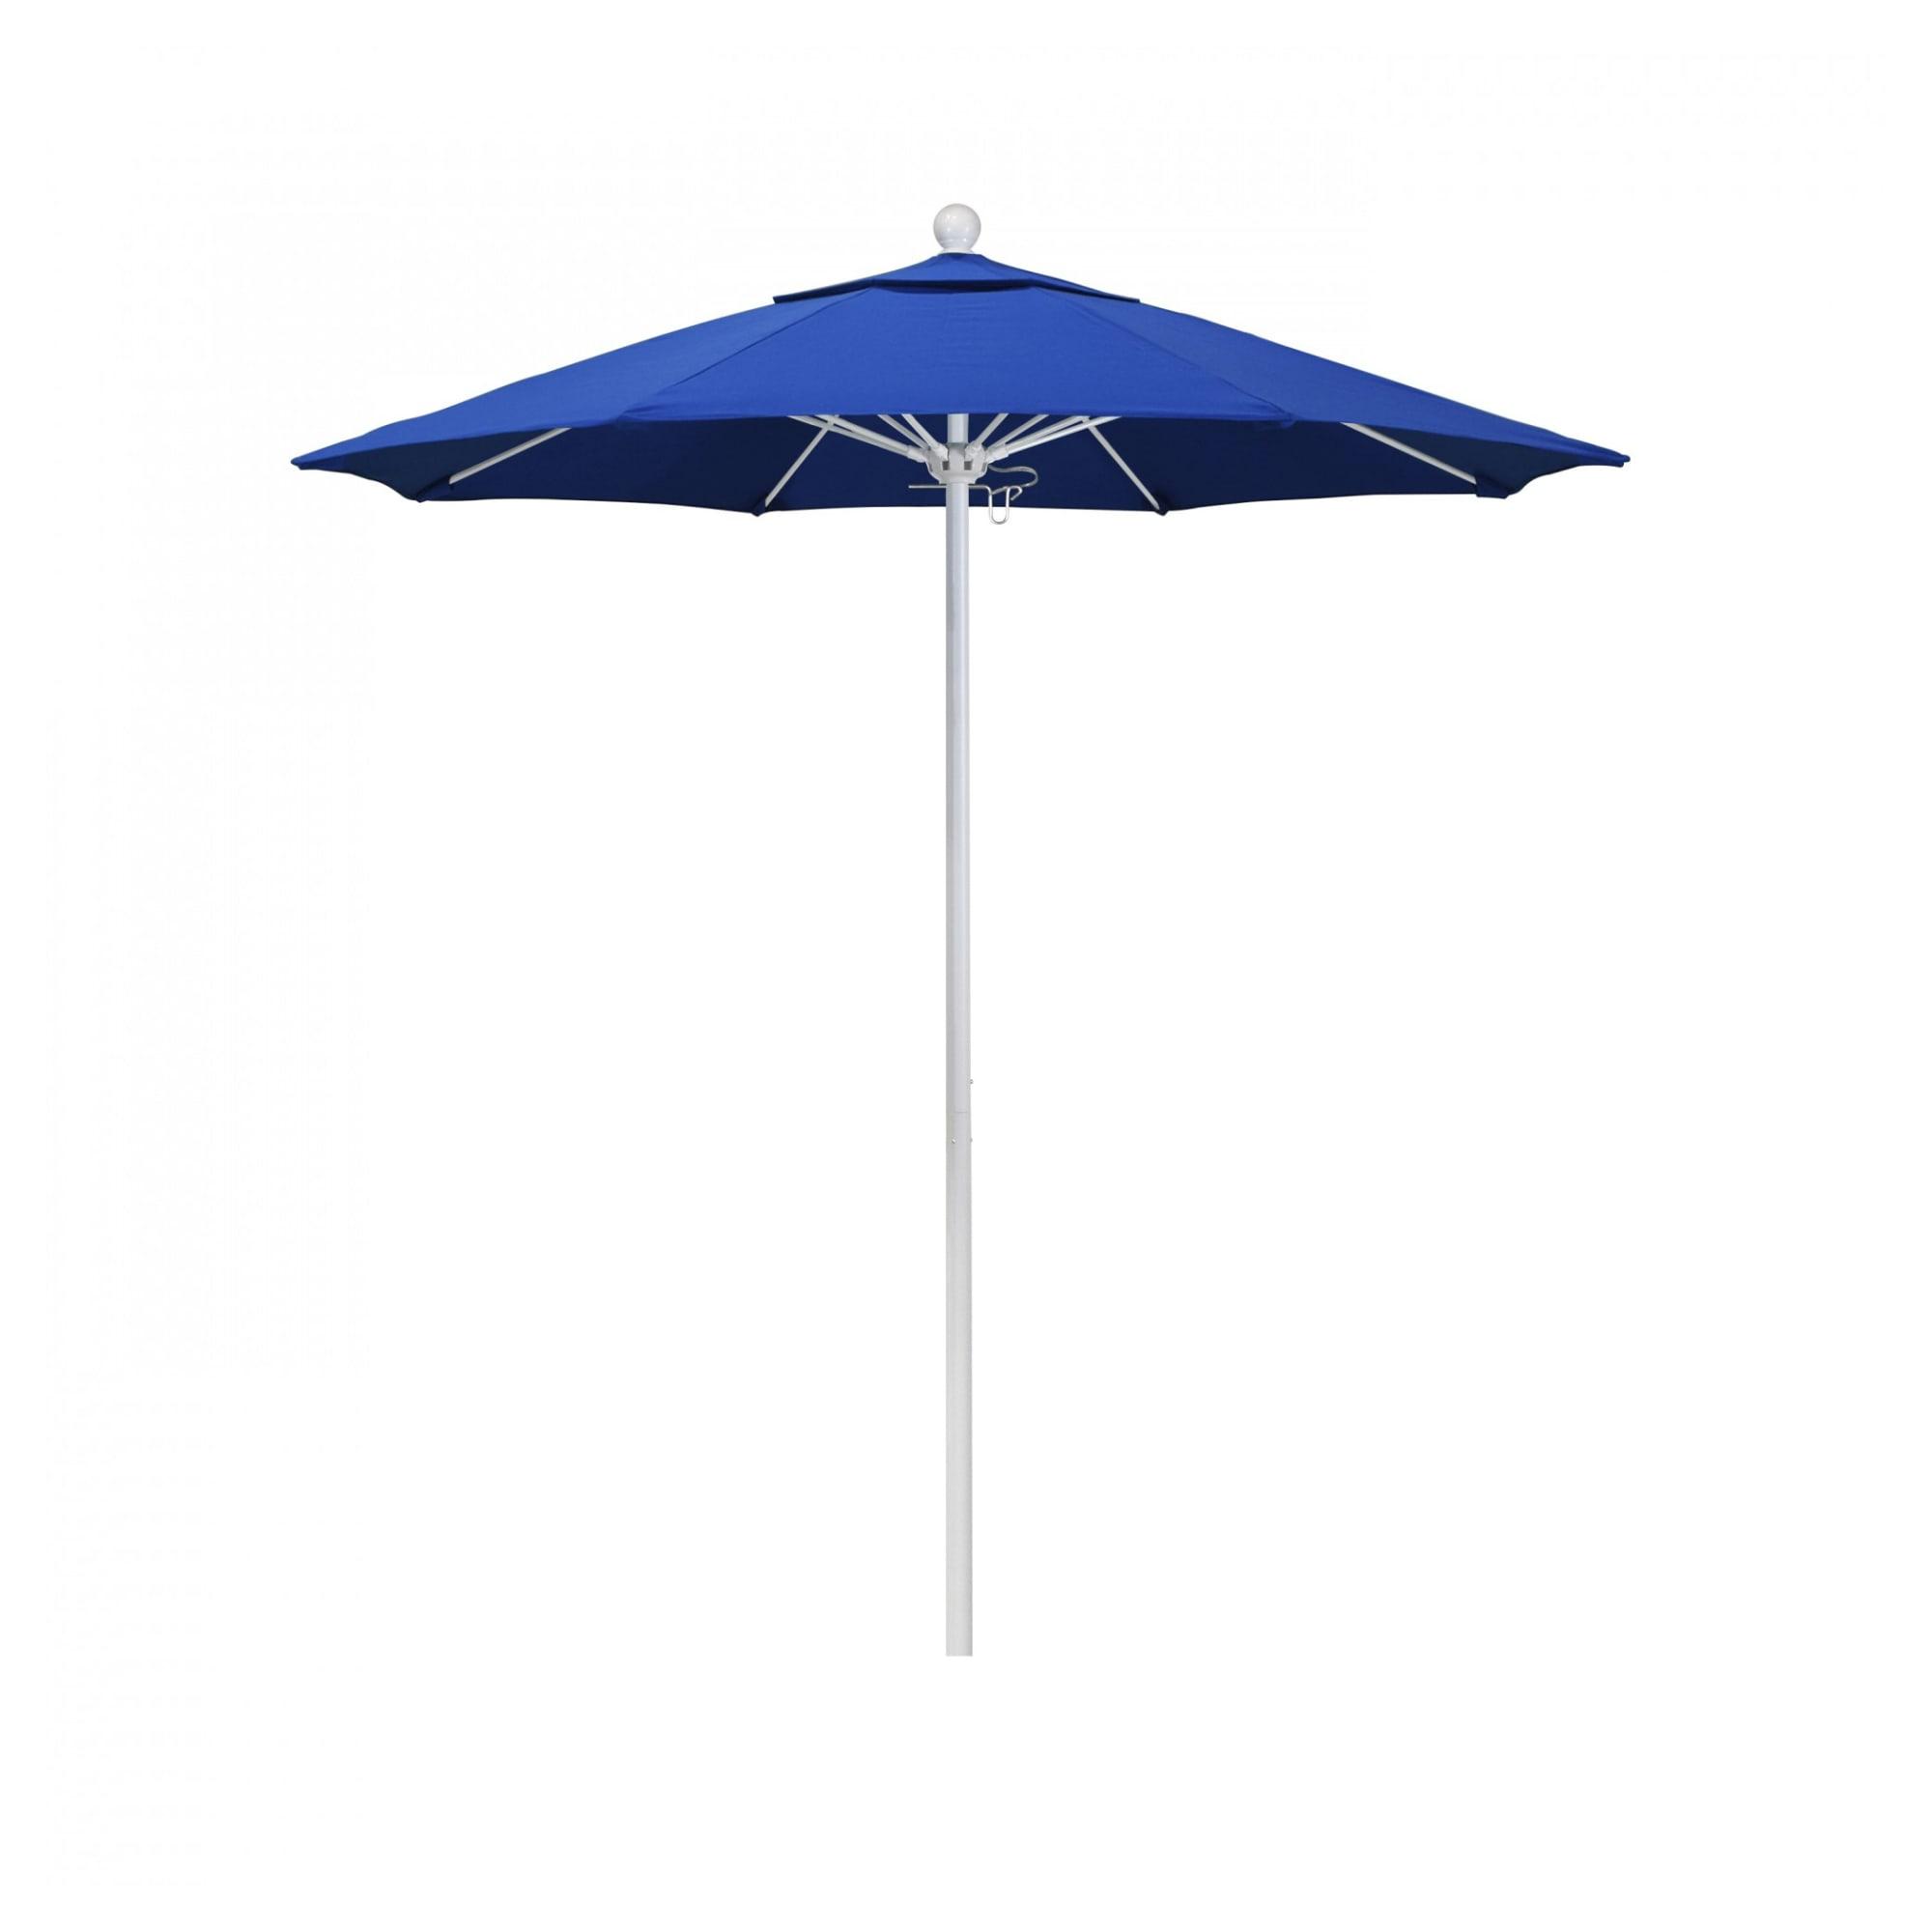 7.5 ft Casey Matted White Aluminum Commercial Umbrella with 7.5 ft Casey Matted White Aluminum Commercial Umbrella